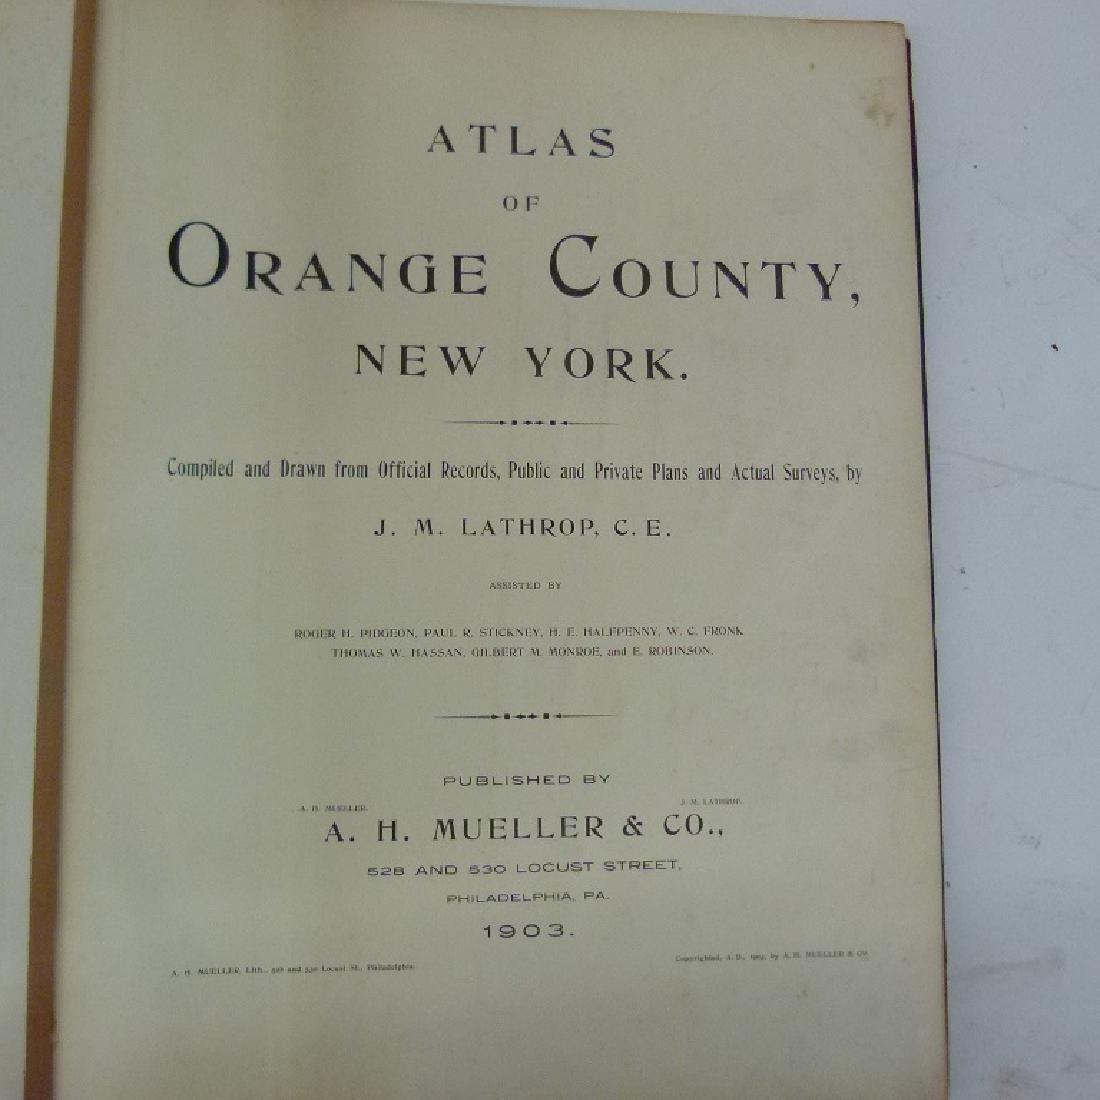 (2) ATLAS OF ORANGE COUNTY NY, A.H. MUELLER 1903 - 3